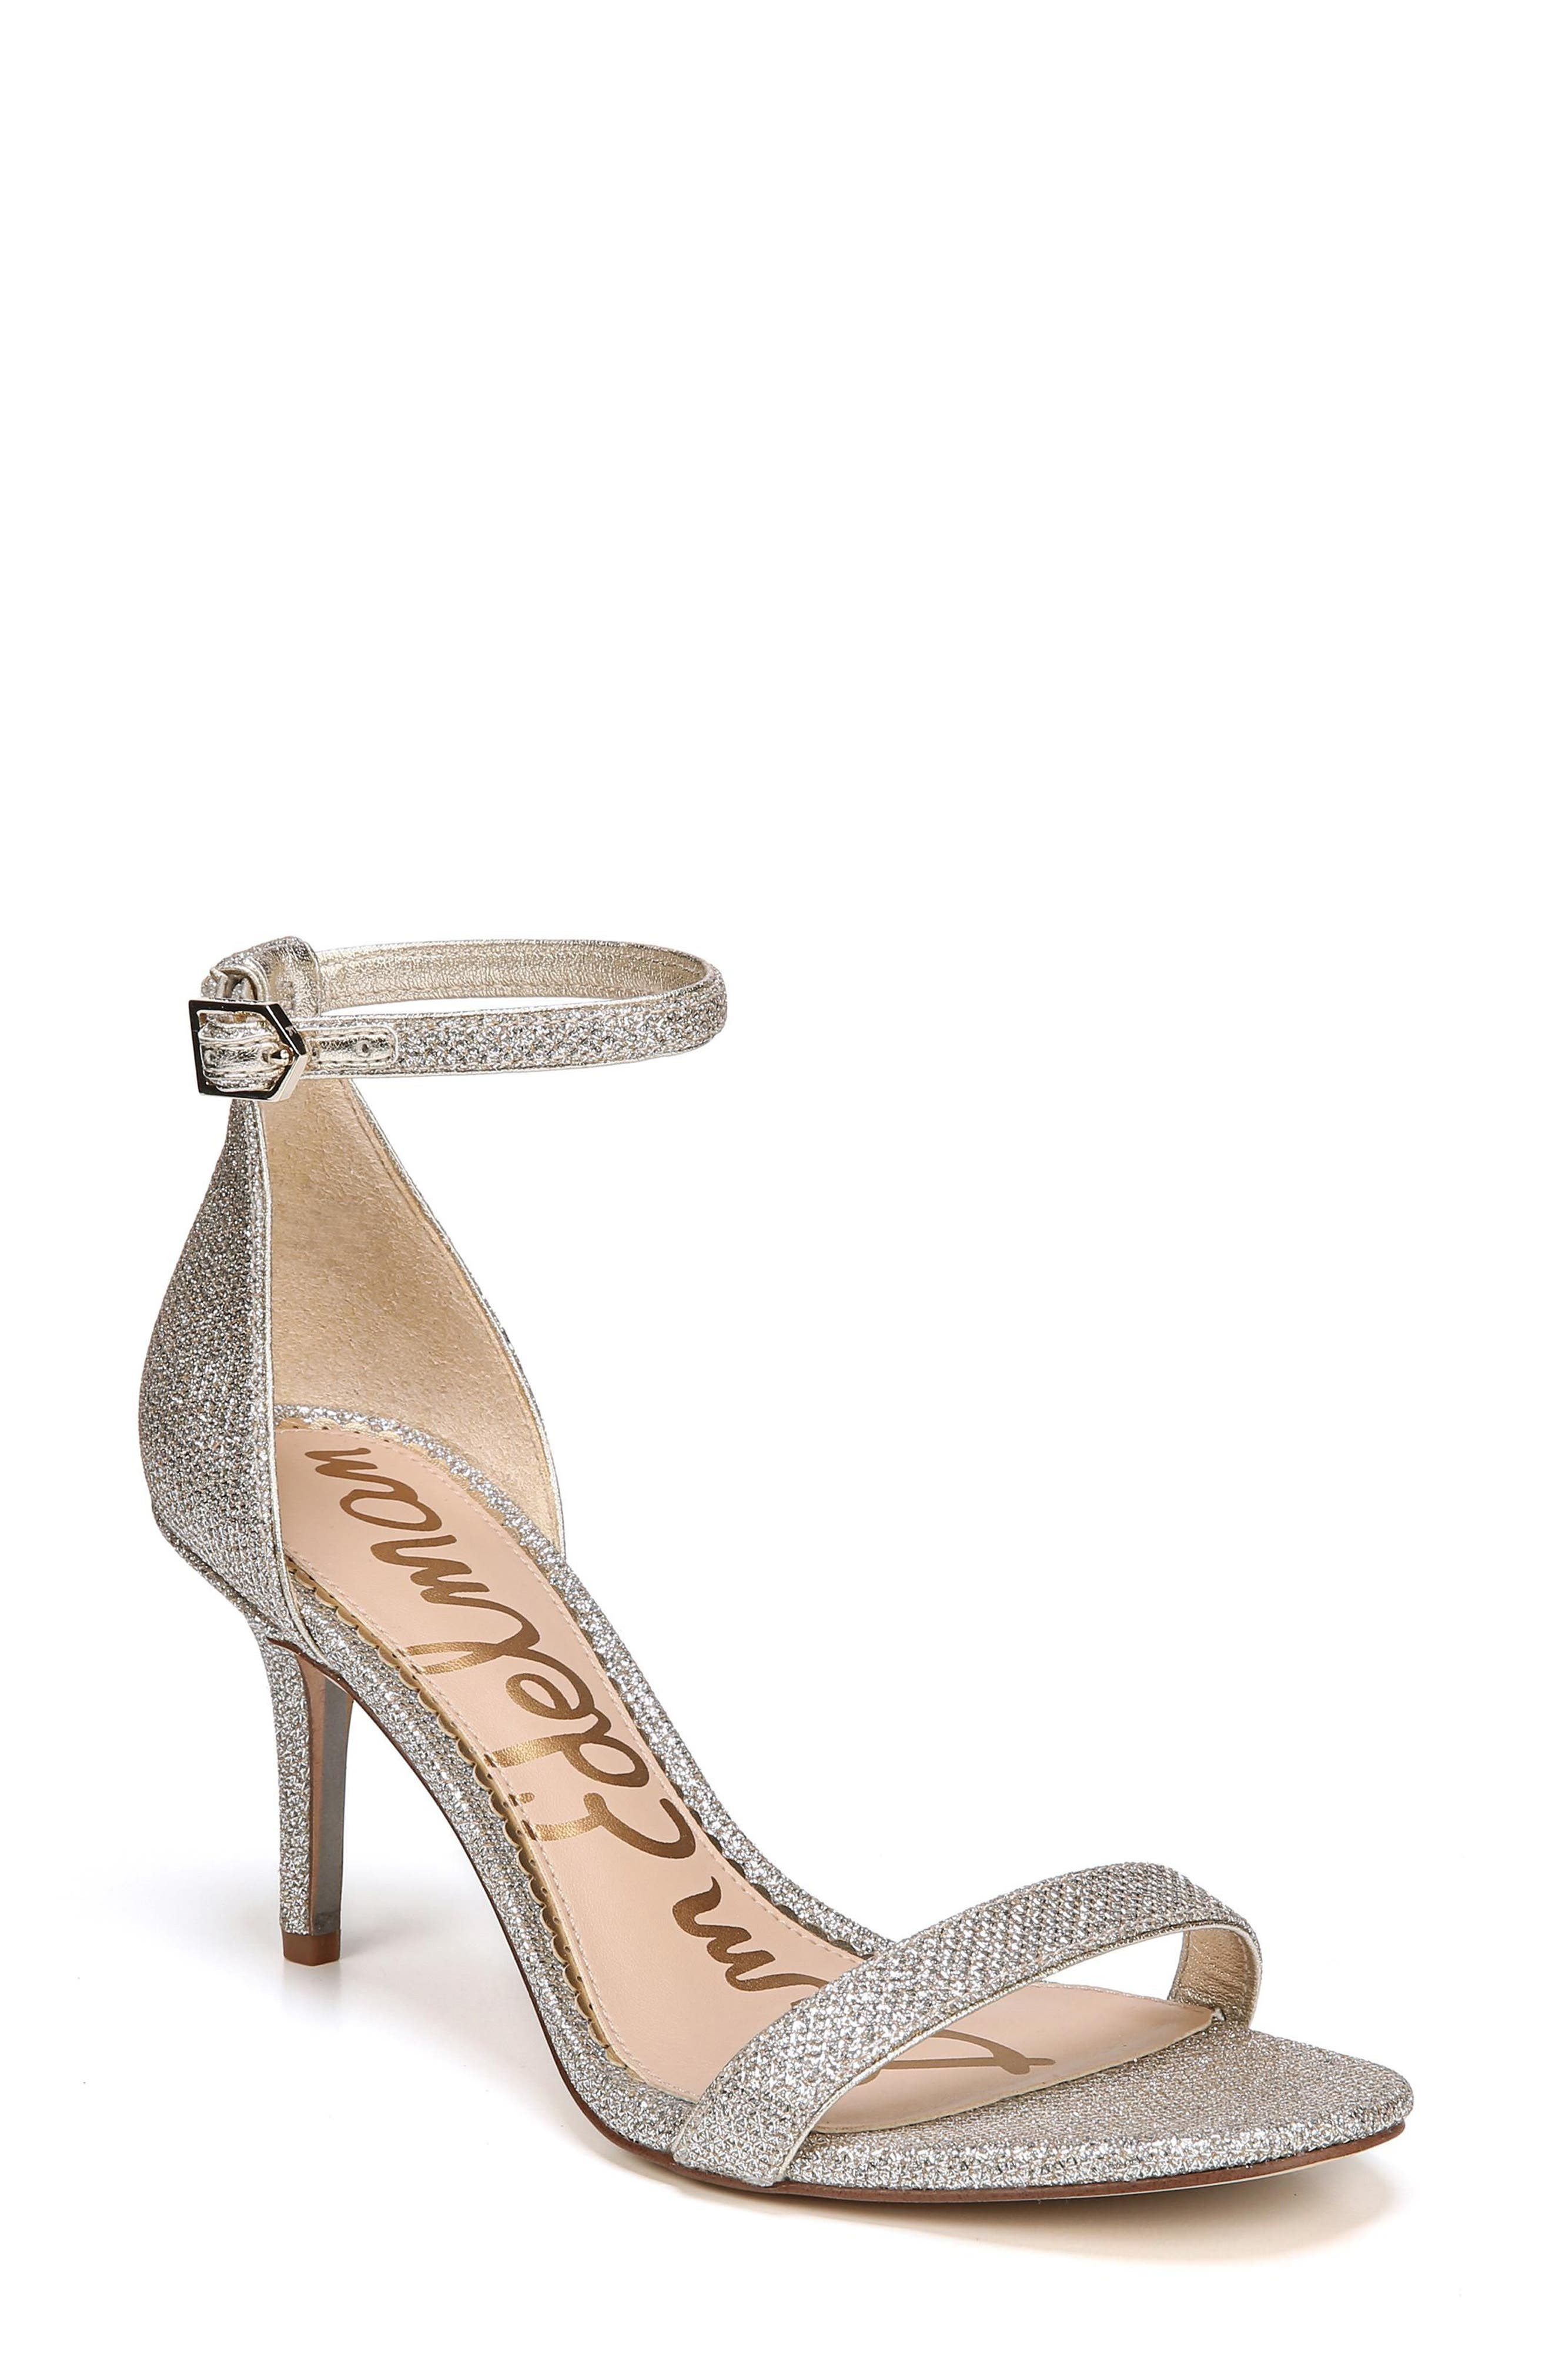 SAM EDELMAN 'Patti' Ankle Strap Sandal, Main, color, JUTE FABRIC